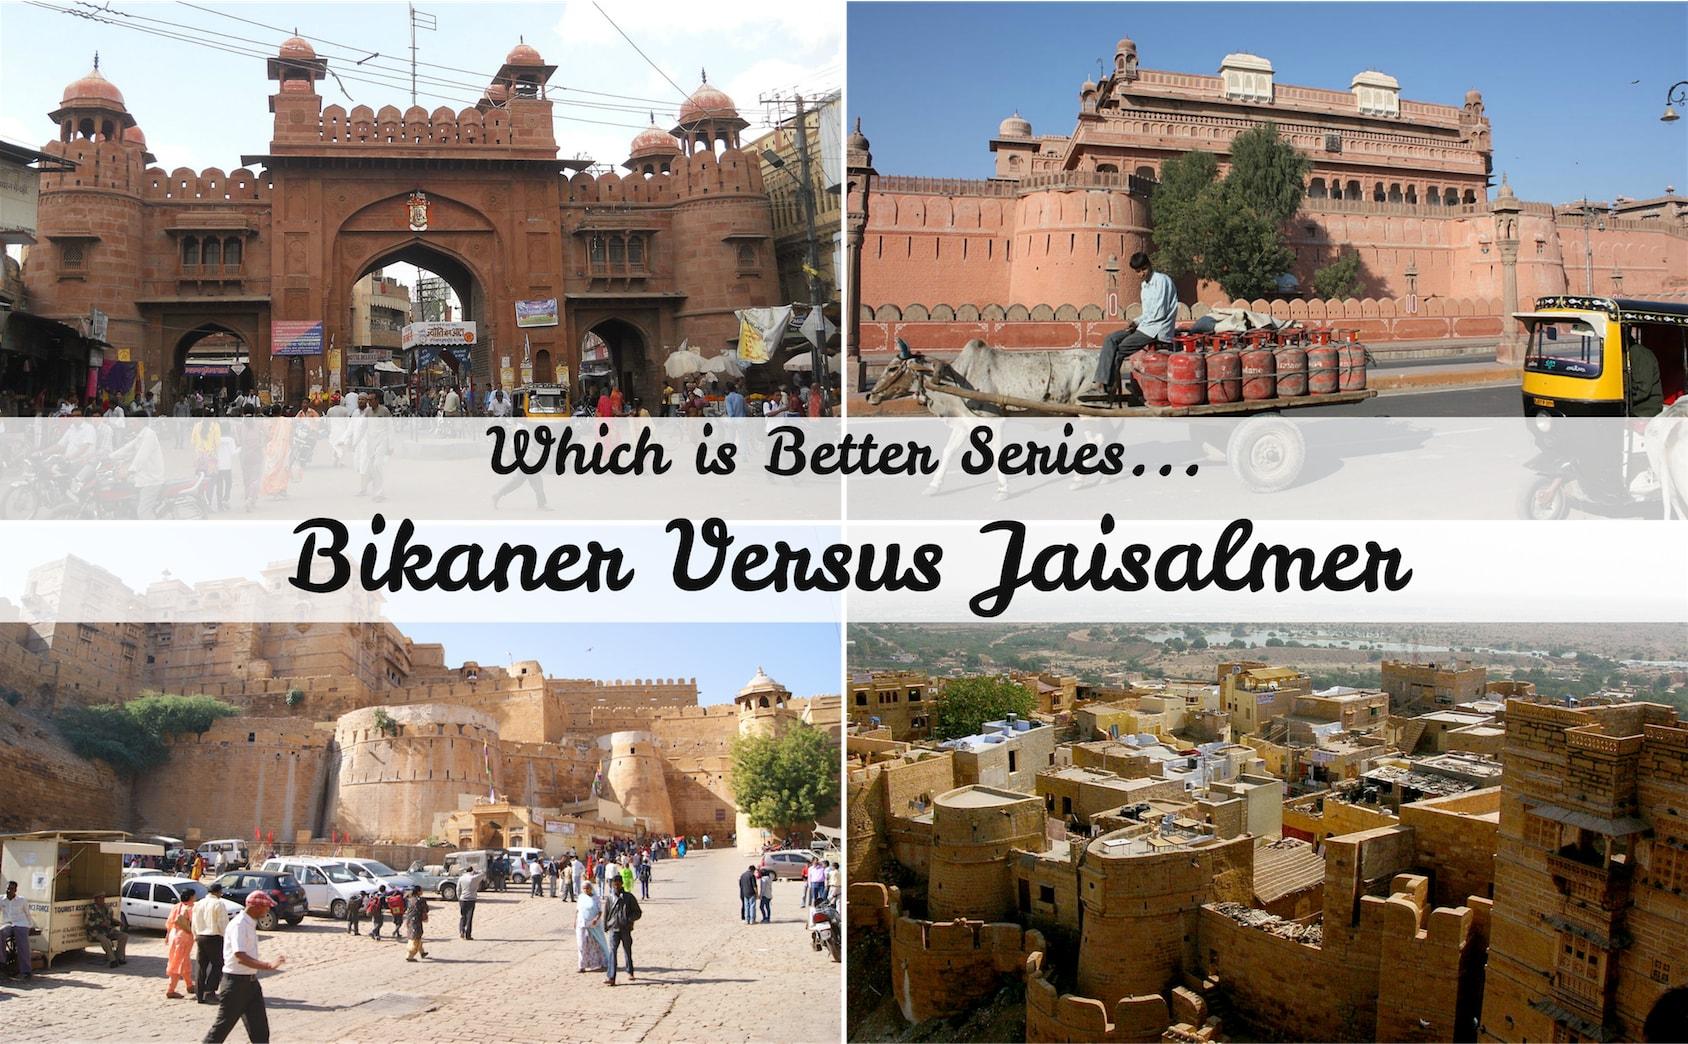 Bikaner Jaisalmer.